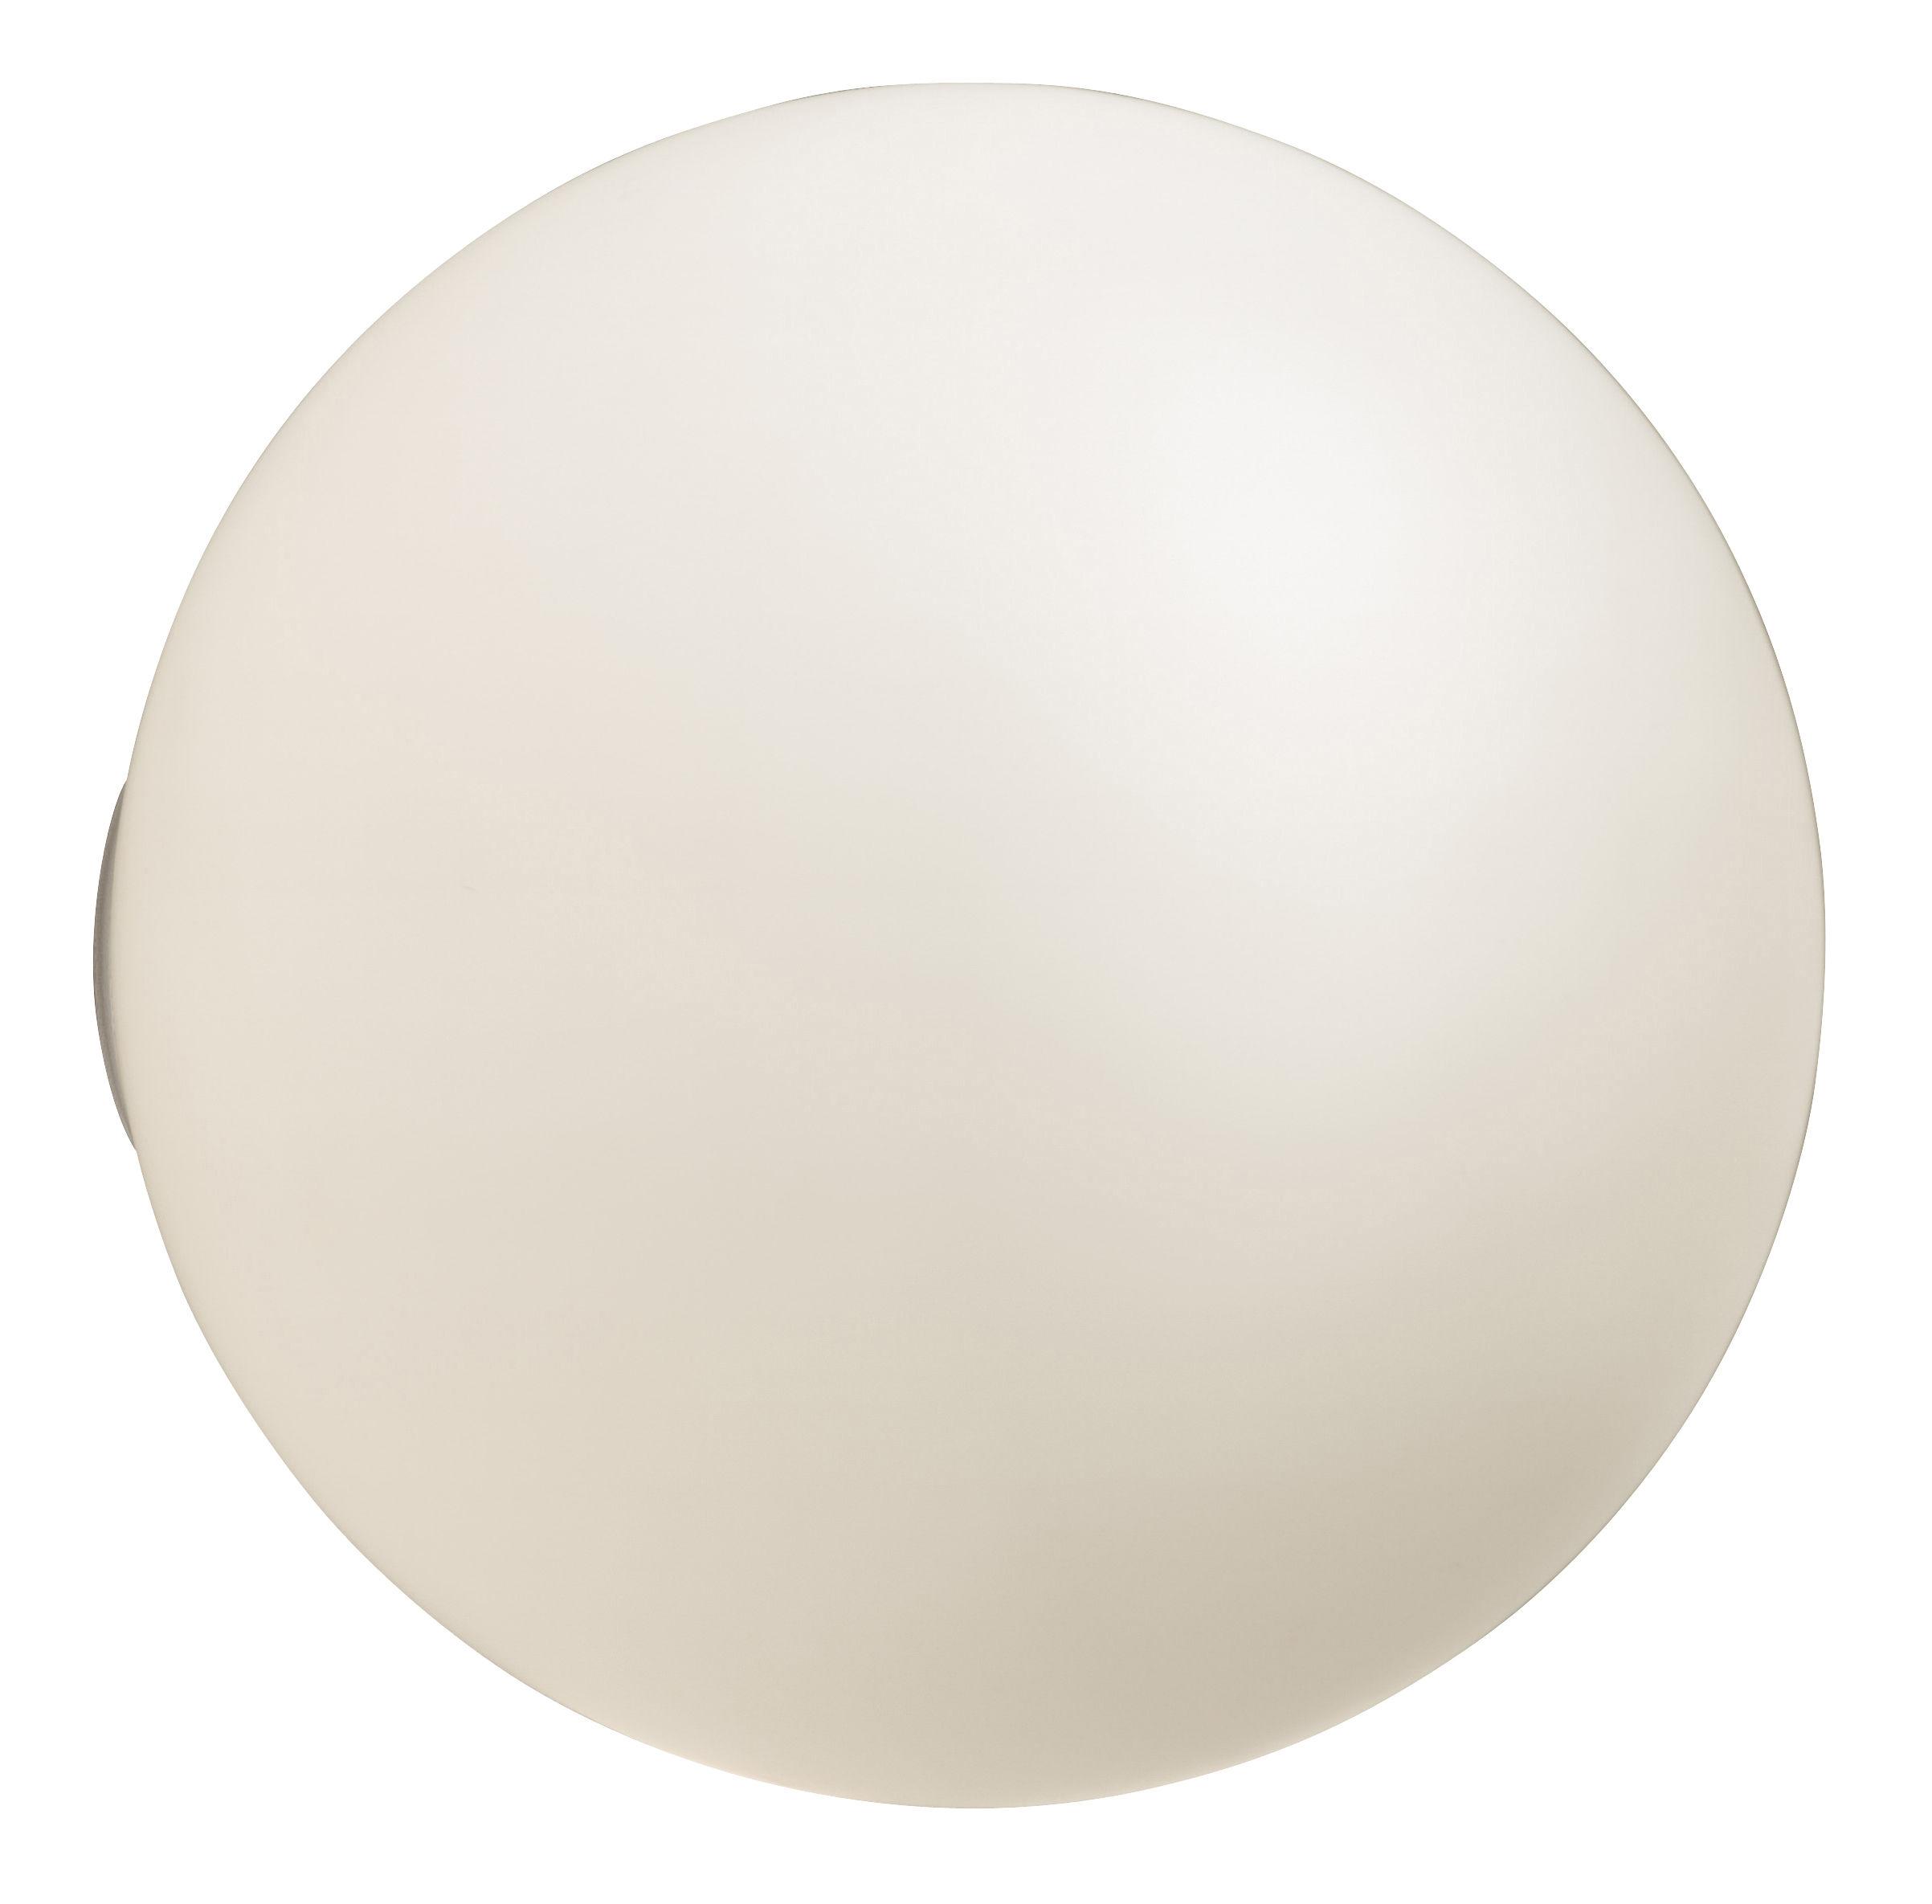 dioscuri wall light ceiling light white by artemide. Black Bedroom Furniture Sets. Home Design Ideas